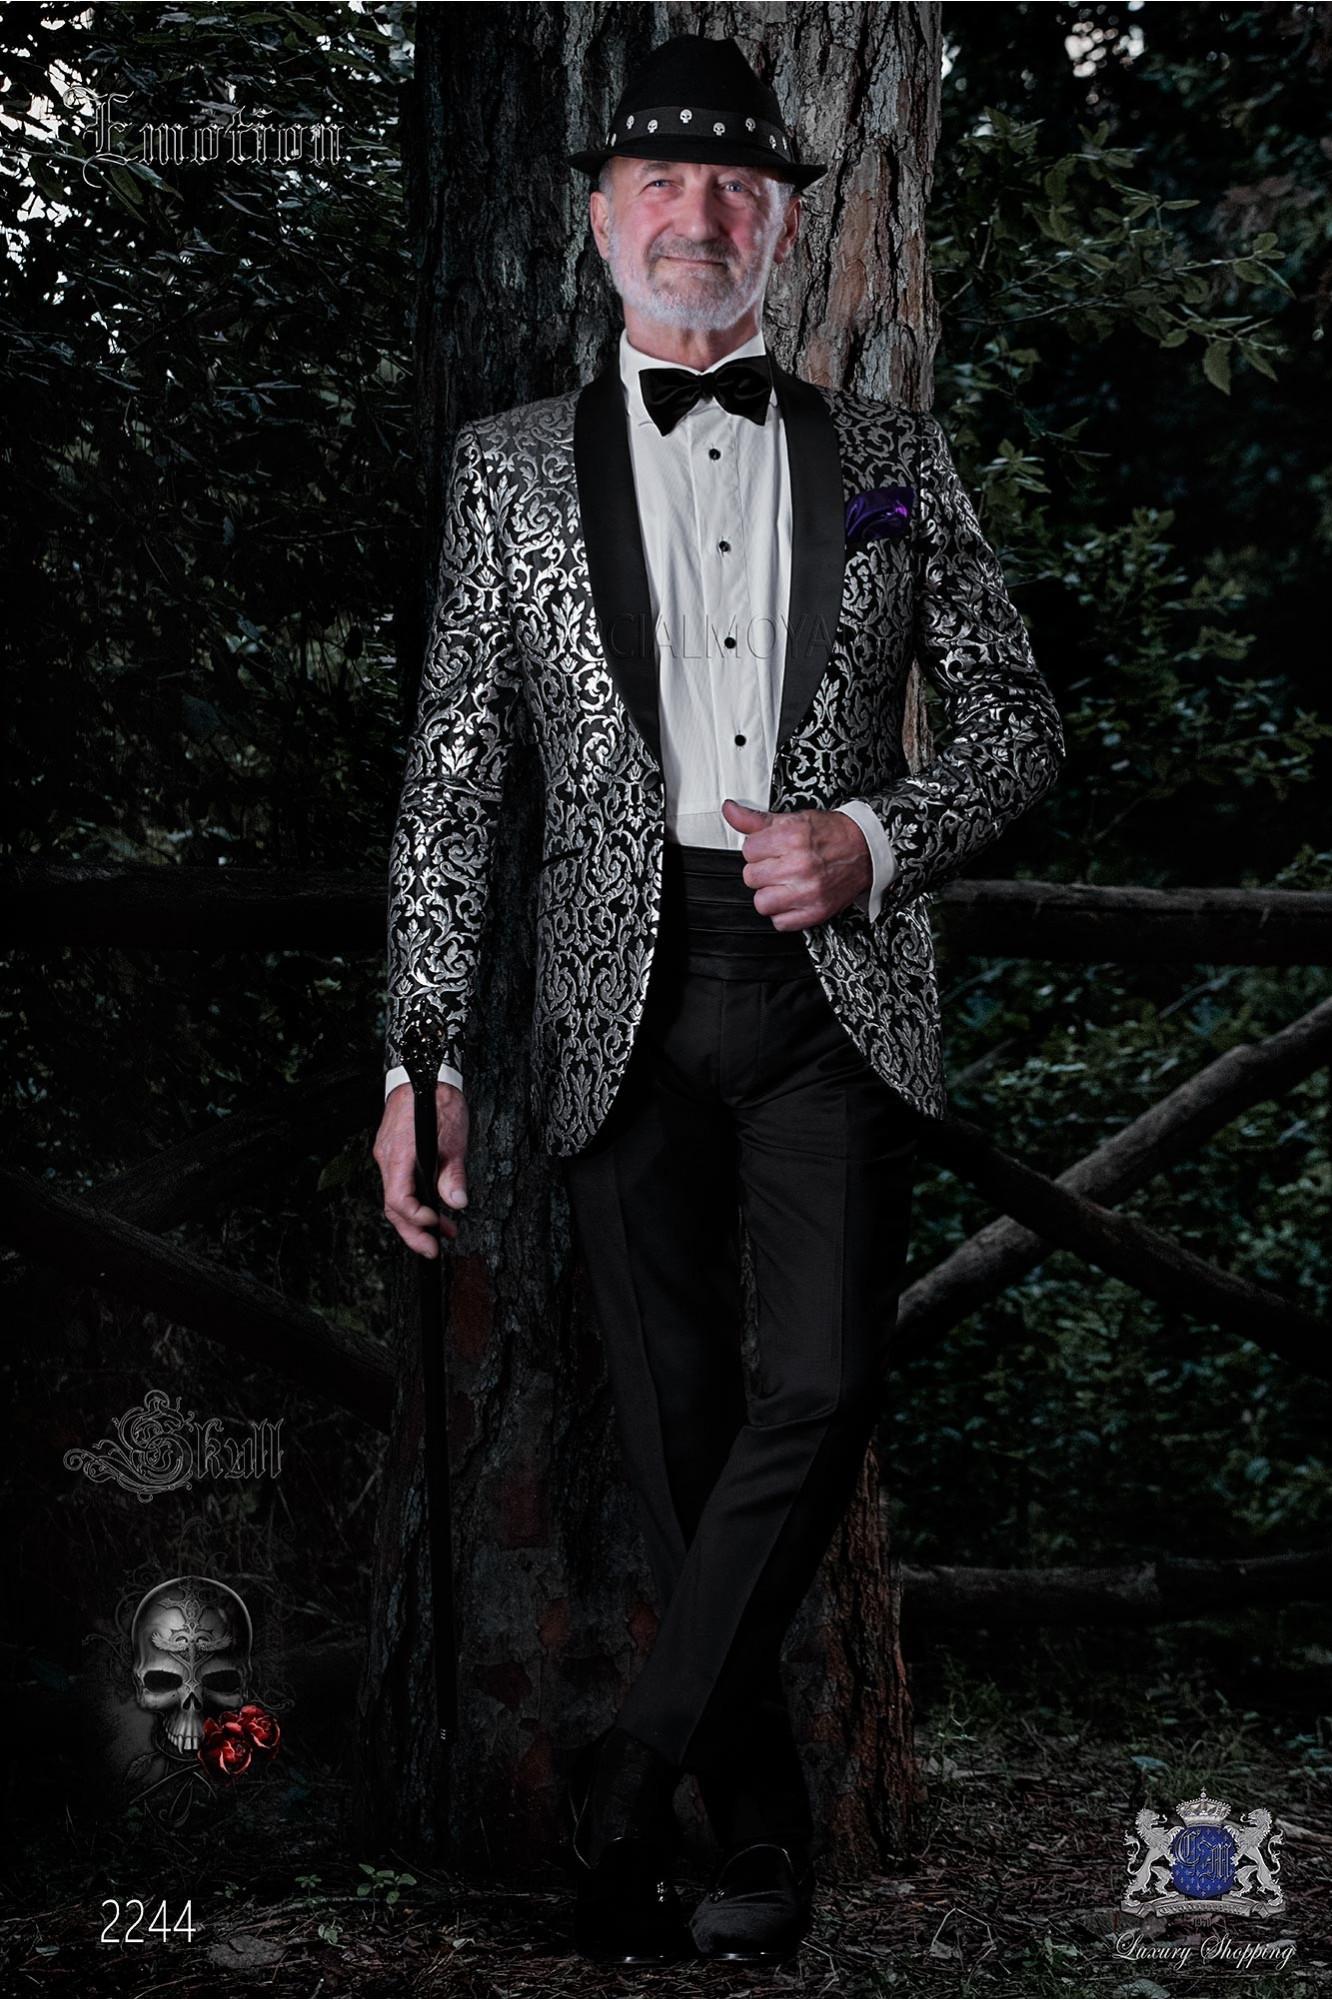 Chaqueta de moda coreana gótica brocada negra y plata